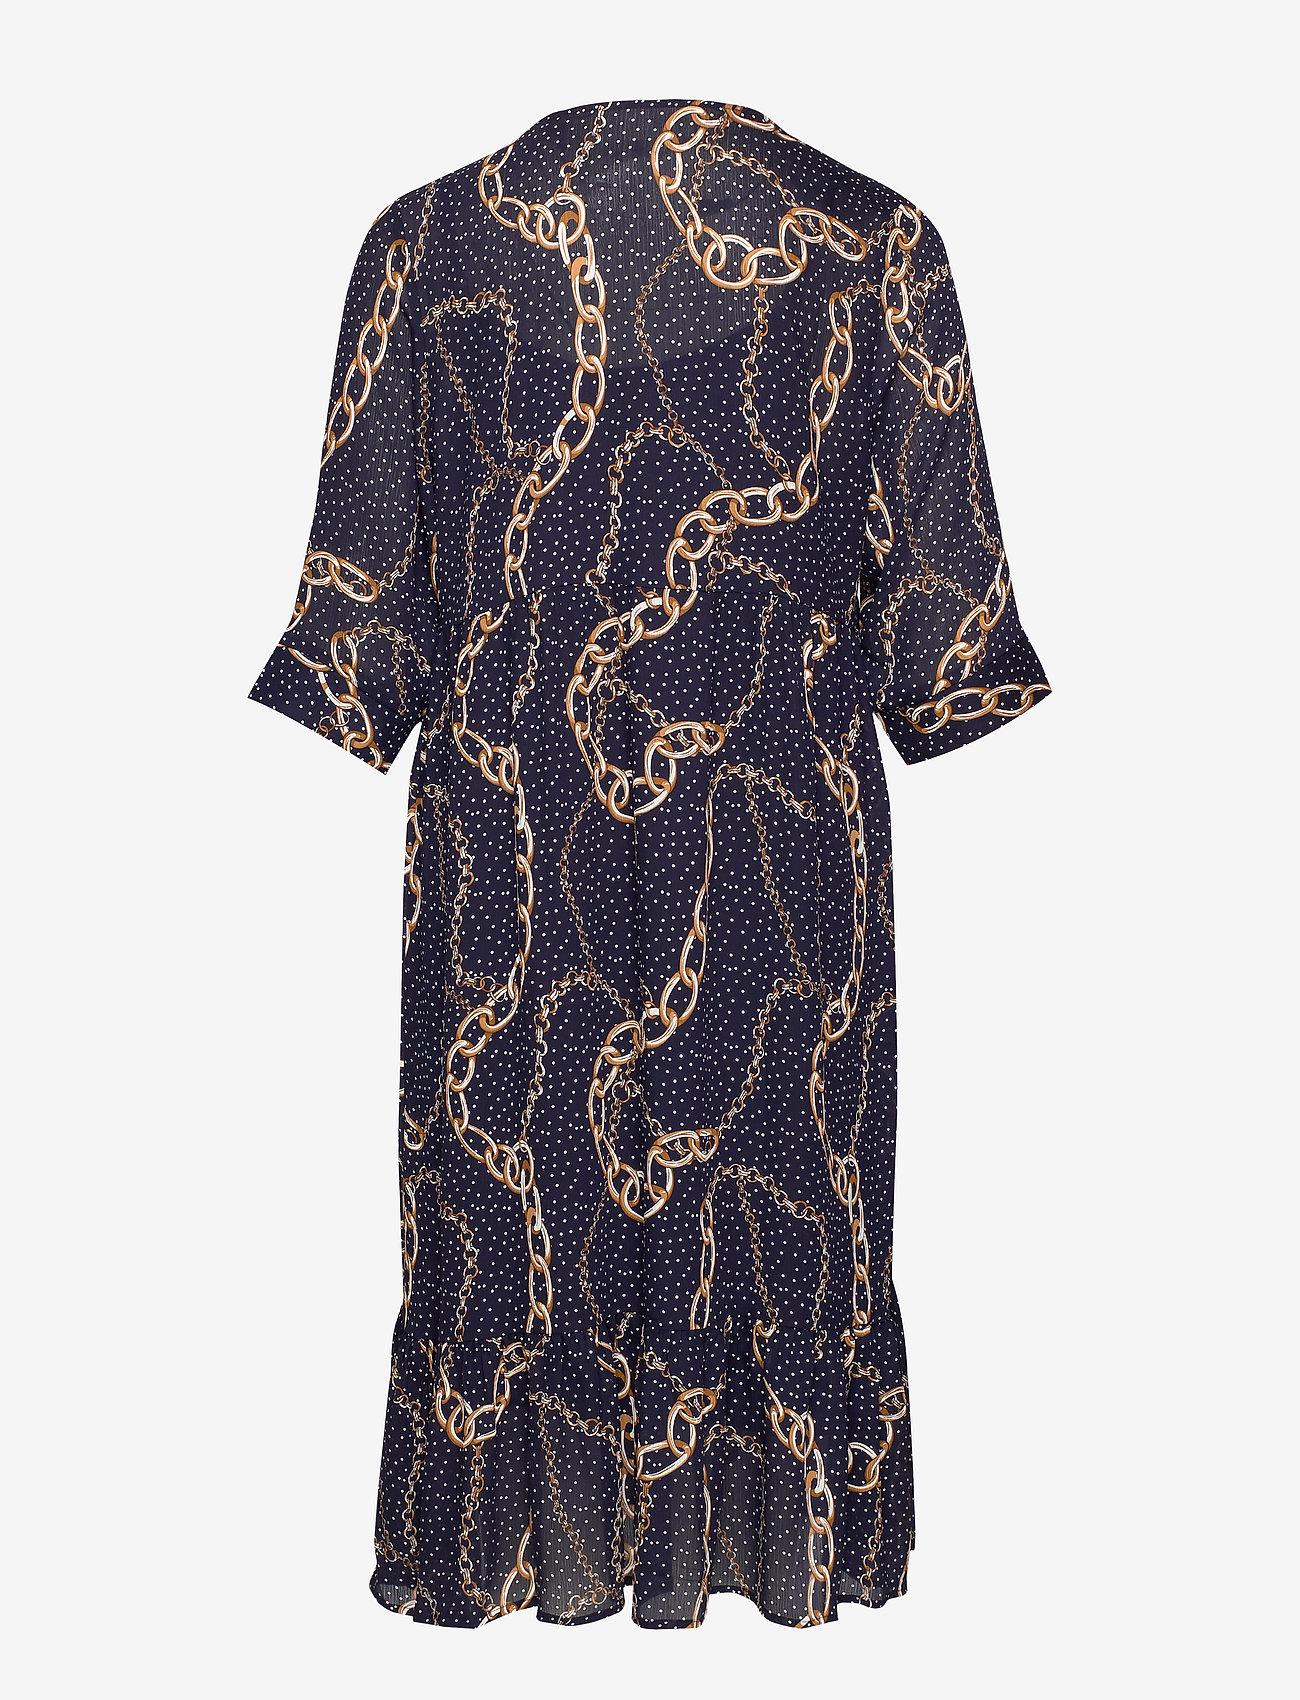 Xandi, ¾, Dress (Black) - Zizzi 1a62g0